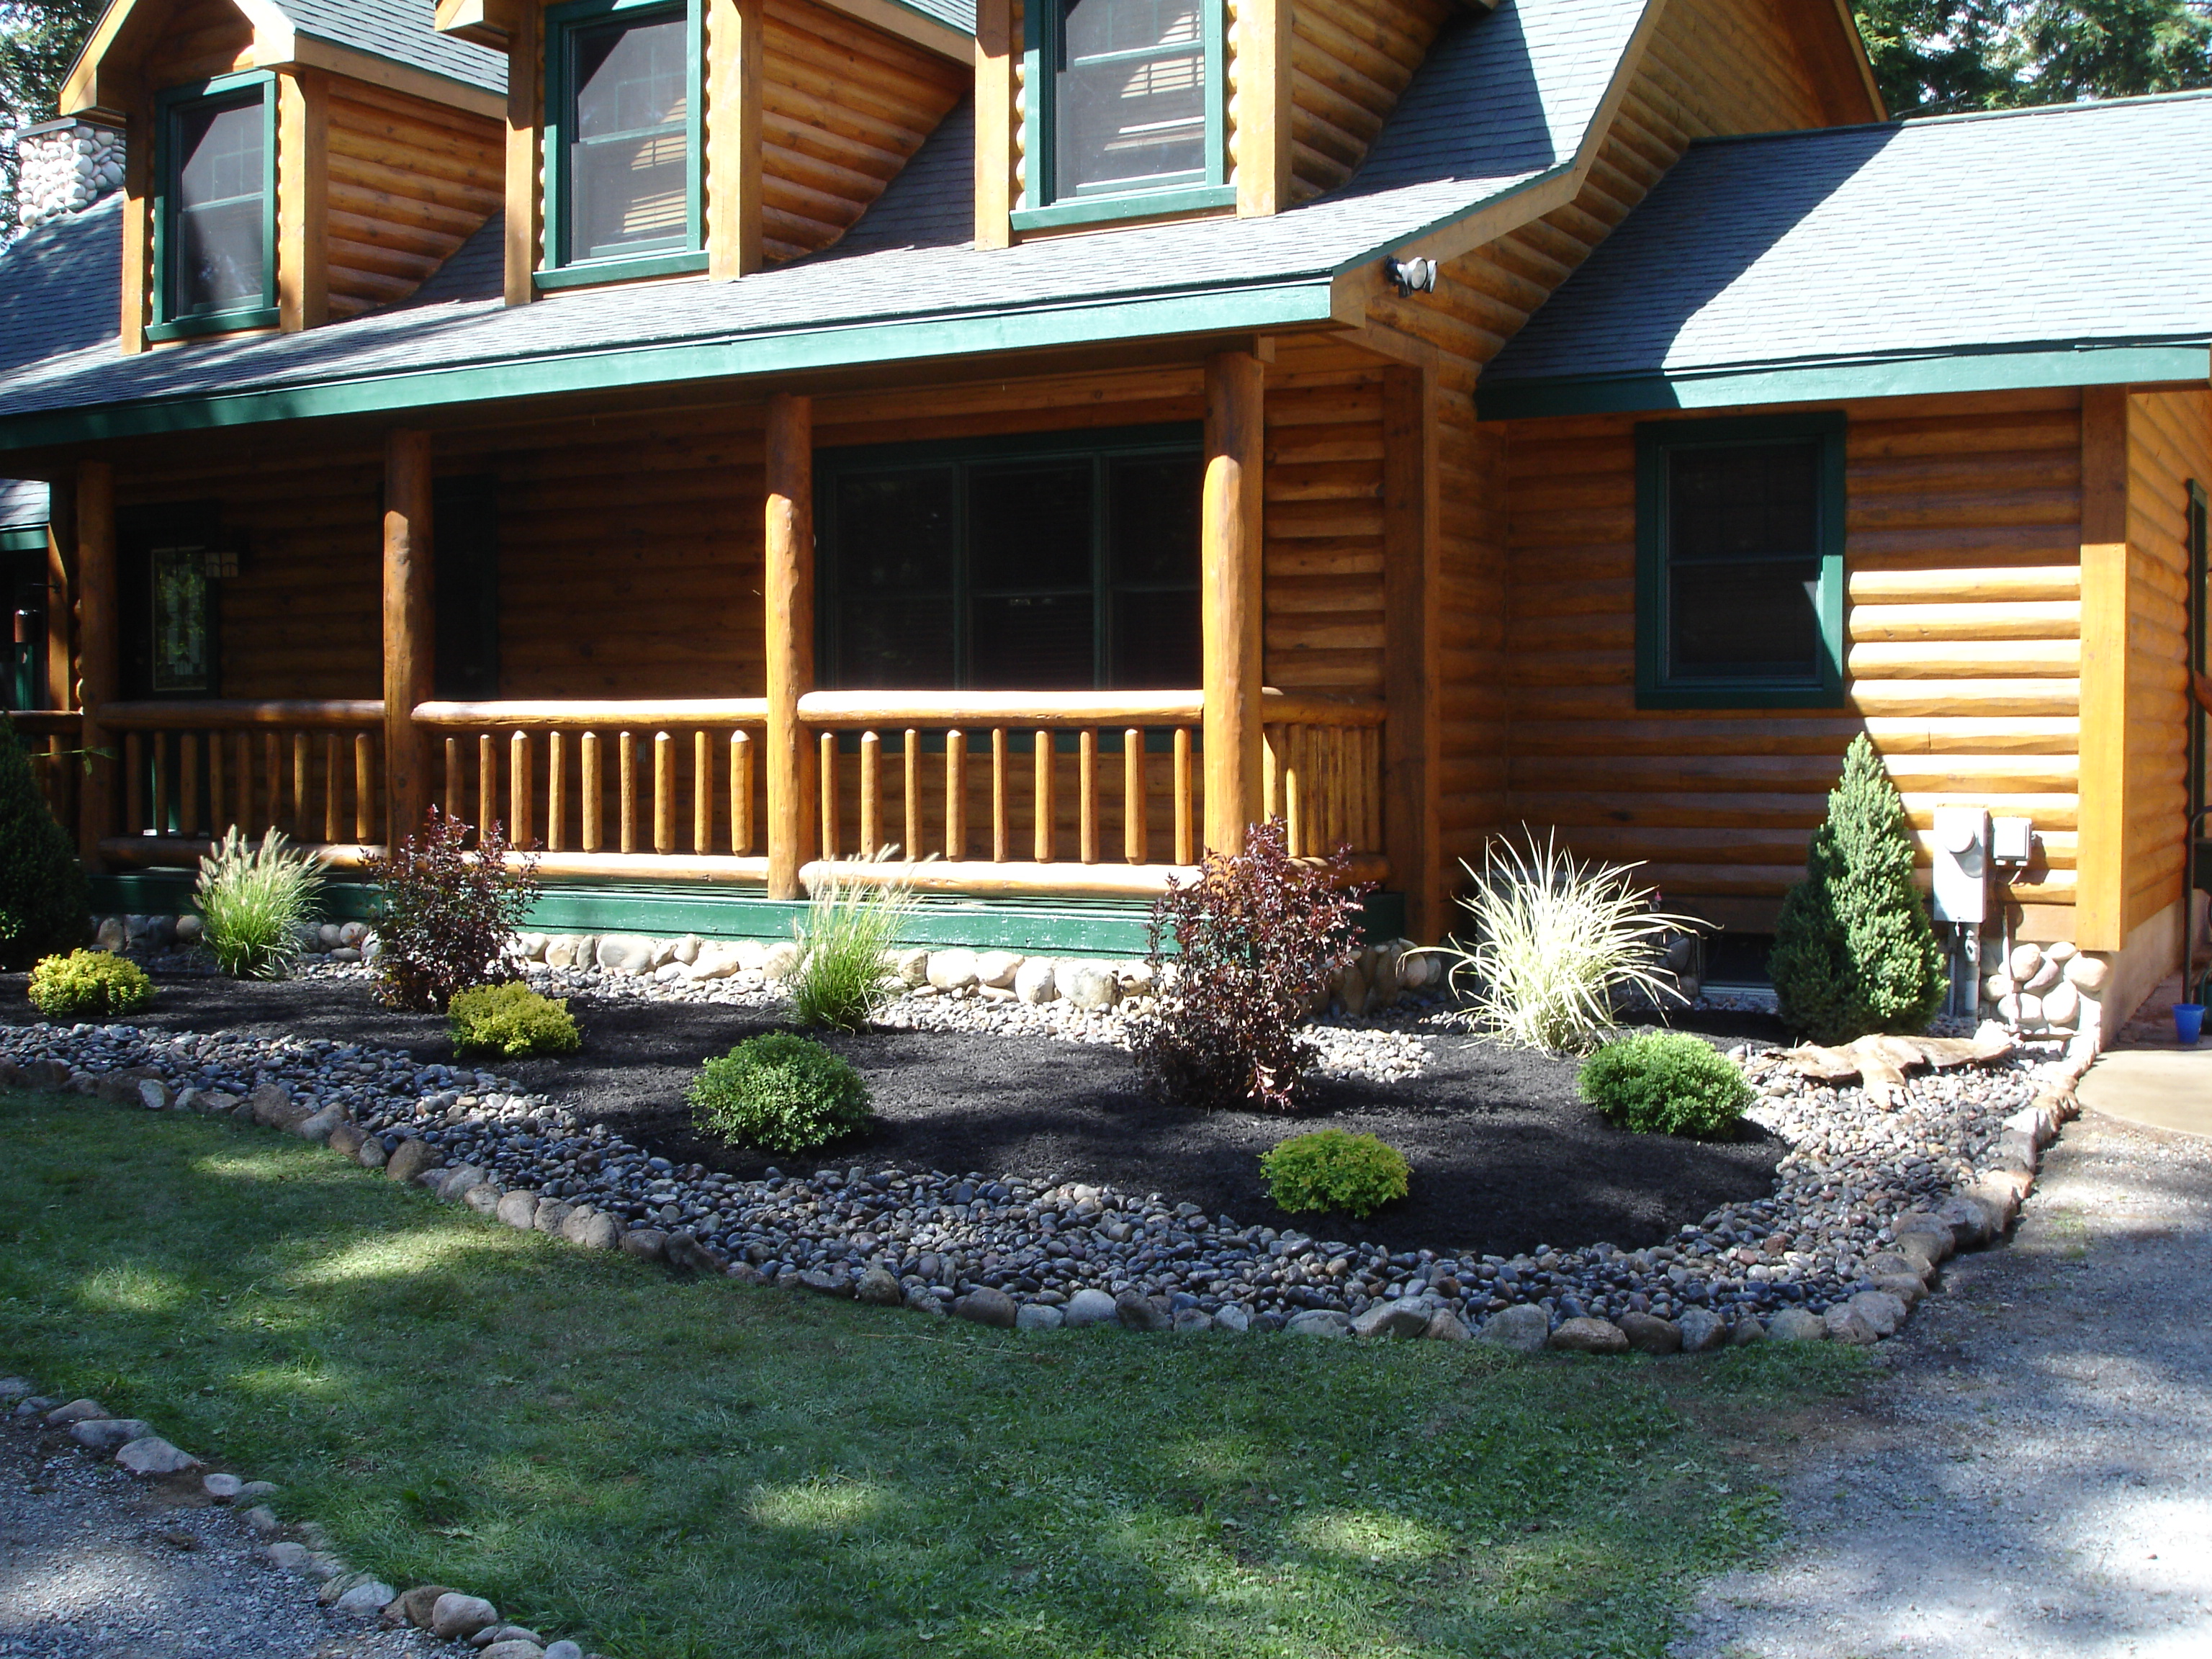 1000+ images about Landscaping Designs & Hardscape Ideas ... on Backyard Hardscape Design id=84325